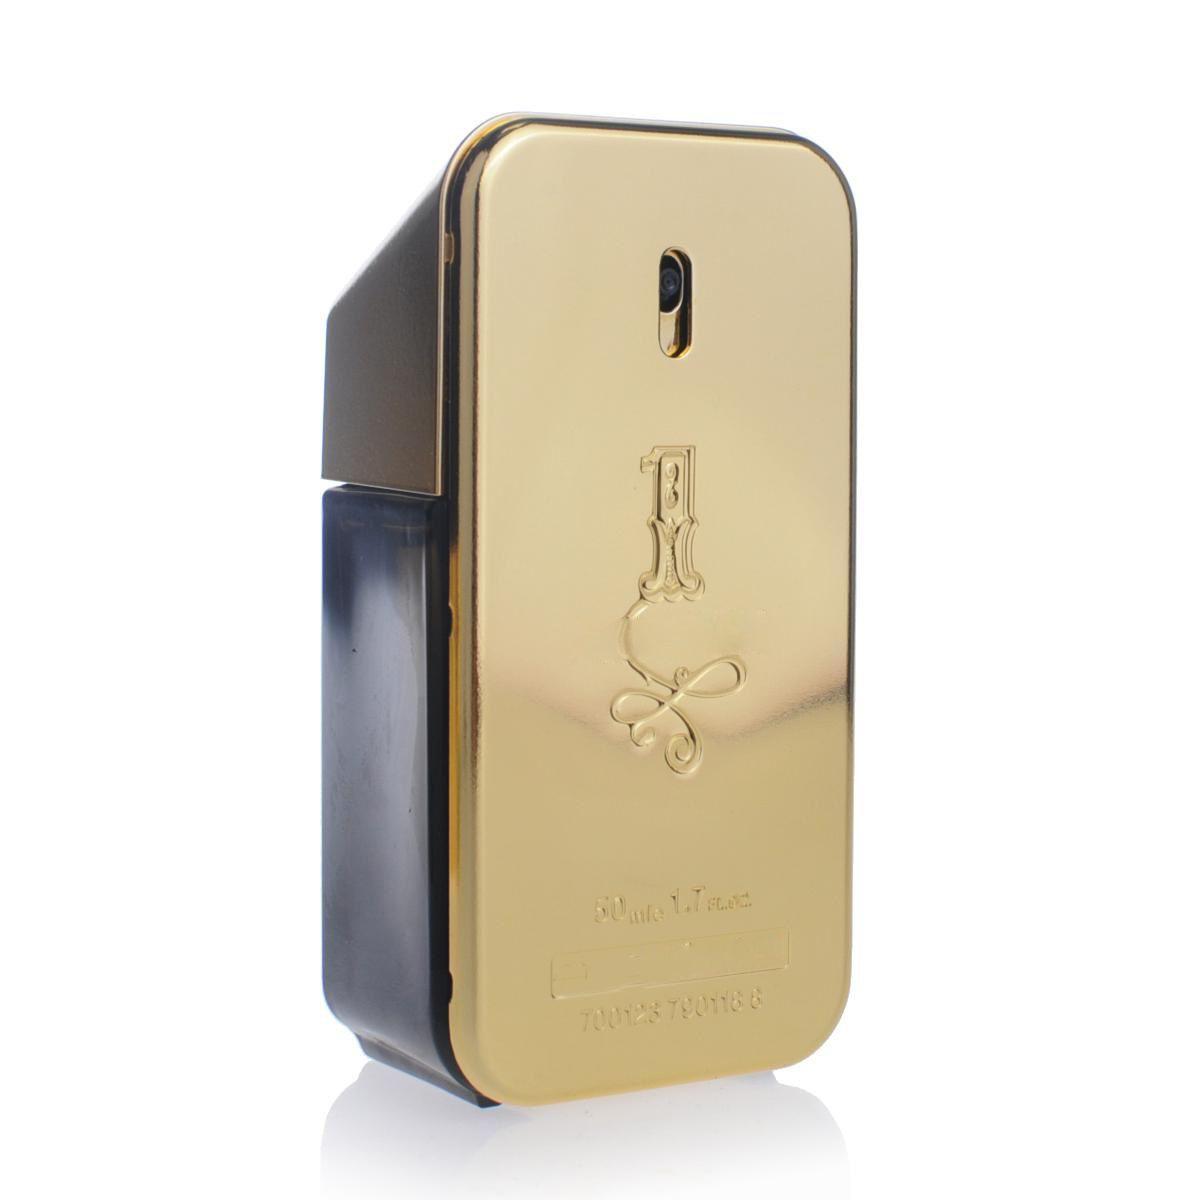 Lüks Parfüm Lady 80ml 2.7 FL.OZ Milyon Parfüm Erkekler İyi Kalite Koku iyi 100ml 3.4 FL.OZ EDT Köln Parfüm